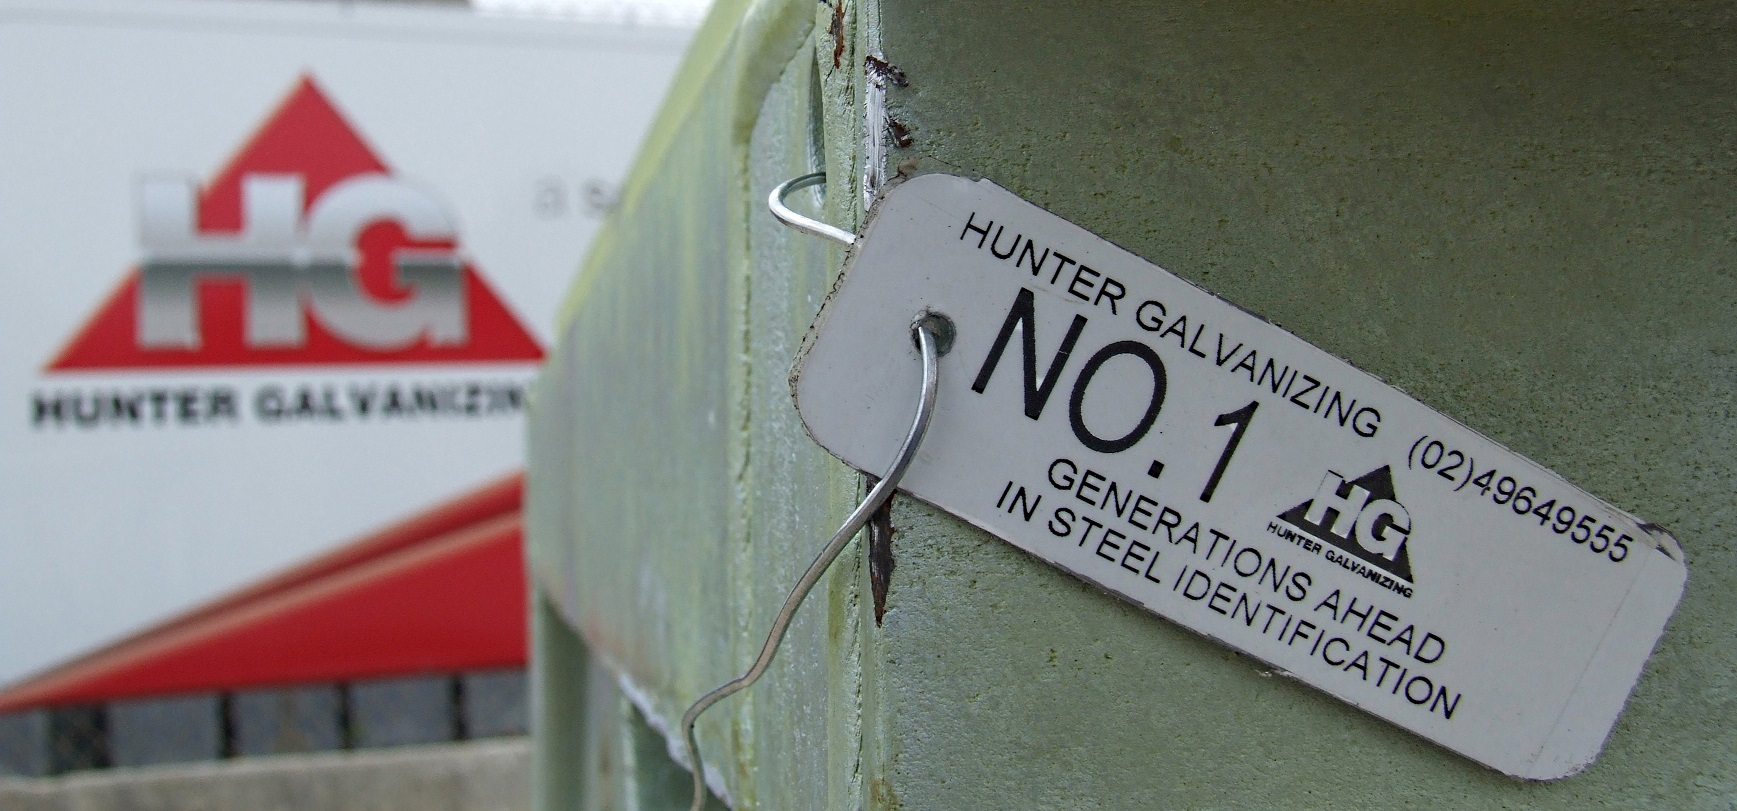 Hunter Galvanizing tags.jpg